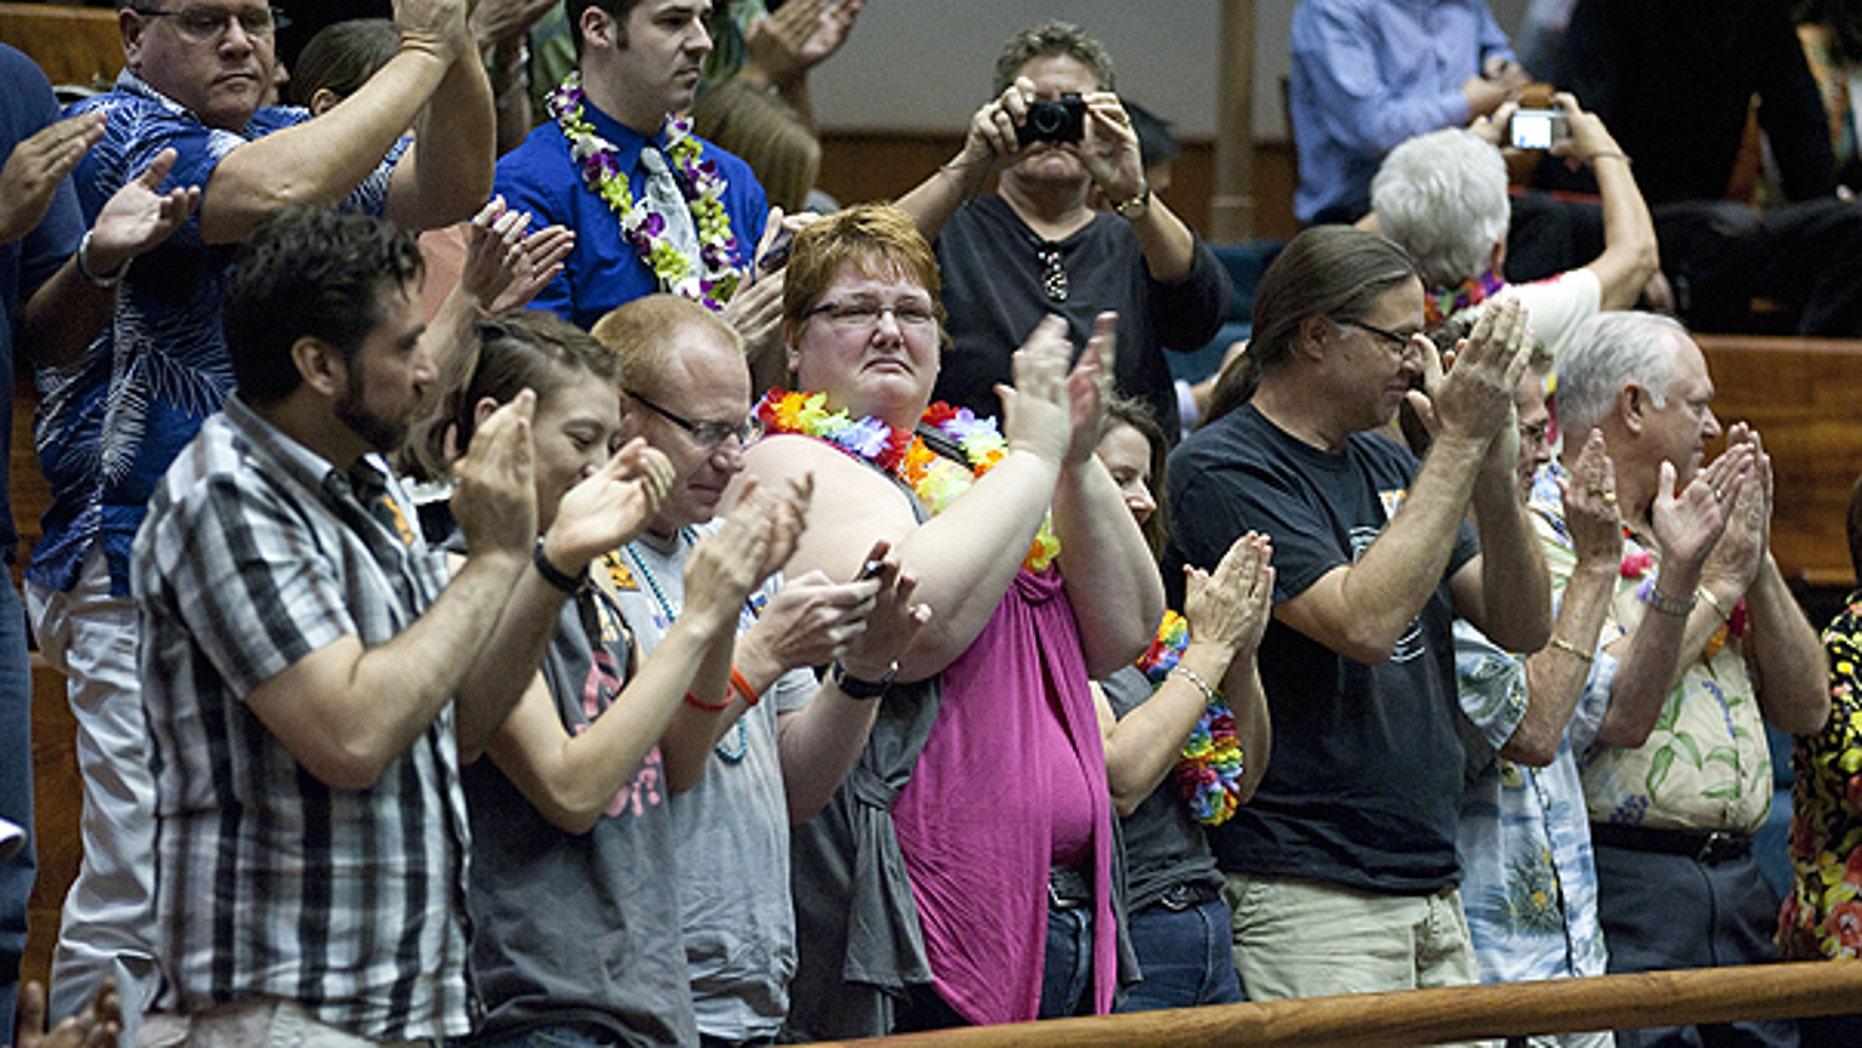 Feb. 16: Supports of the Hawaii Civil Unions Bill applaud, celebrating the Hawaii Senate's vote 18-5 to approve the Civil Unions bill at the State Capitol in Honolulu, Hawaii.